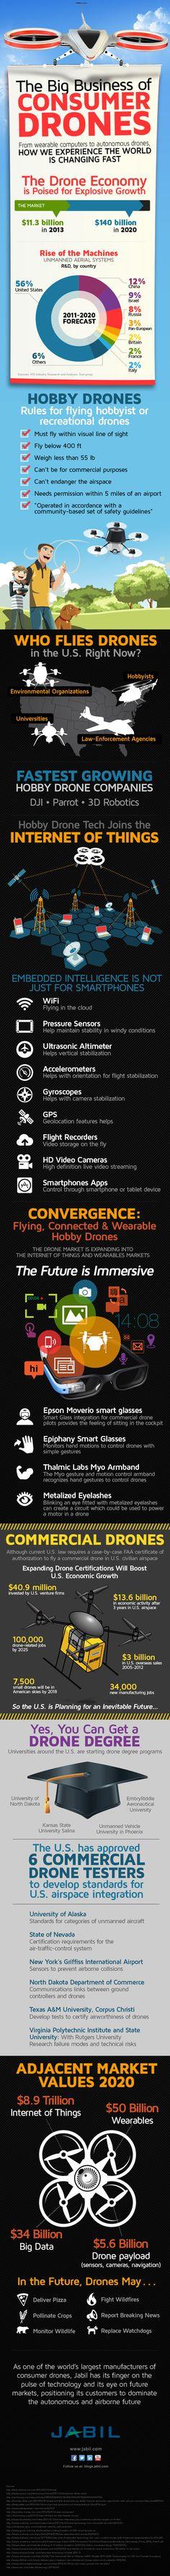 Big Business of Consumer Drones www.SELLaBIZ.gr ΠΩΛΗΣΕΙΣ ΕΠΙΧΕΙΡΗΣΕΩΝ ΔΩΡΕΑΝ ΑΓΓΕΛΙΕΣ ΠΩΛΗΣΗΣ ΕΠΙΧΕΙΡΗΣΗΣ BUSINESS FOR SALE FREE OF CHARGE PUBLICATION